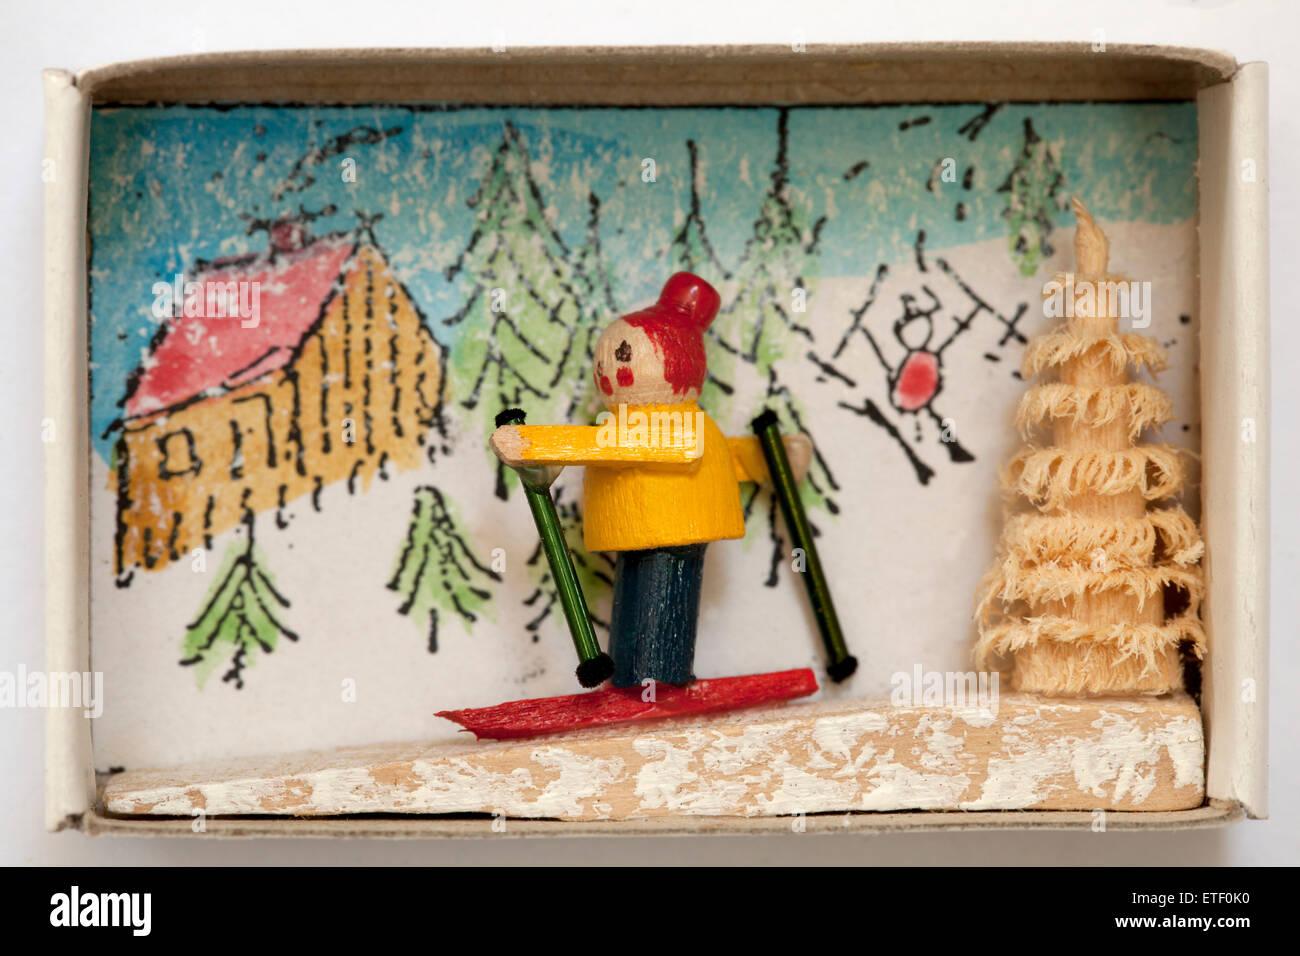 Vintage Matchbox containing hand made wood folk art toy. Erzgebirgische Volkskunst in der Zundholzschachtel - Stock Image